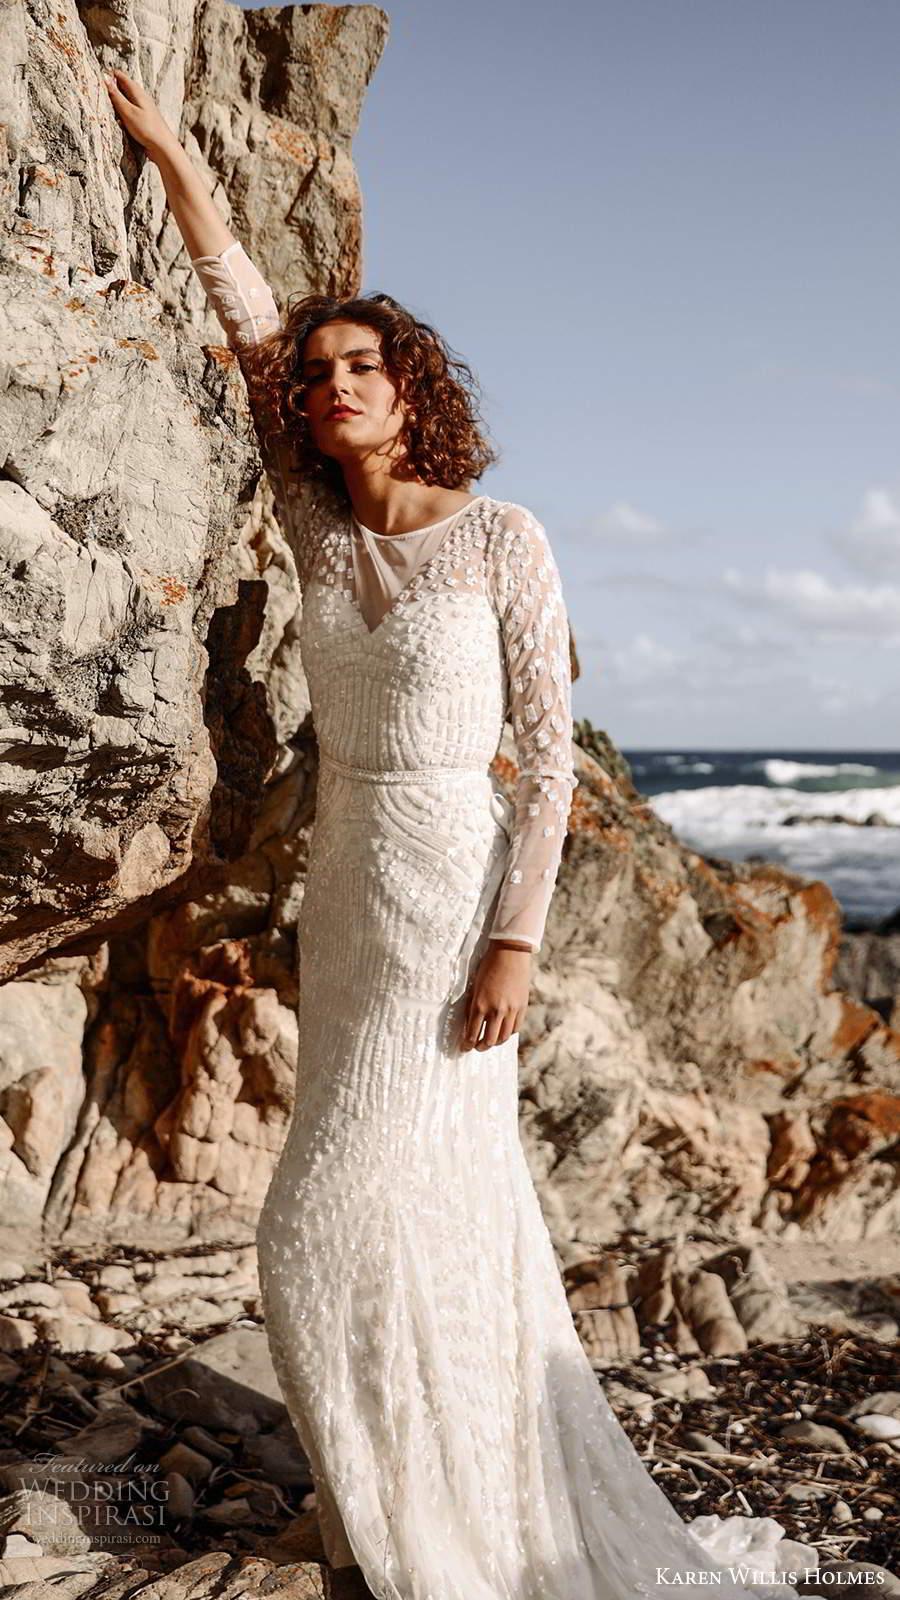 karen willis holmes 2020 bridal illusion long sleeves jewel neckline fully embellished sheath wedding dress chapel train (1) mv